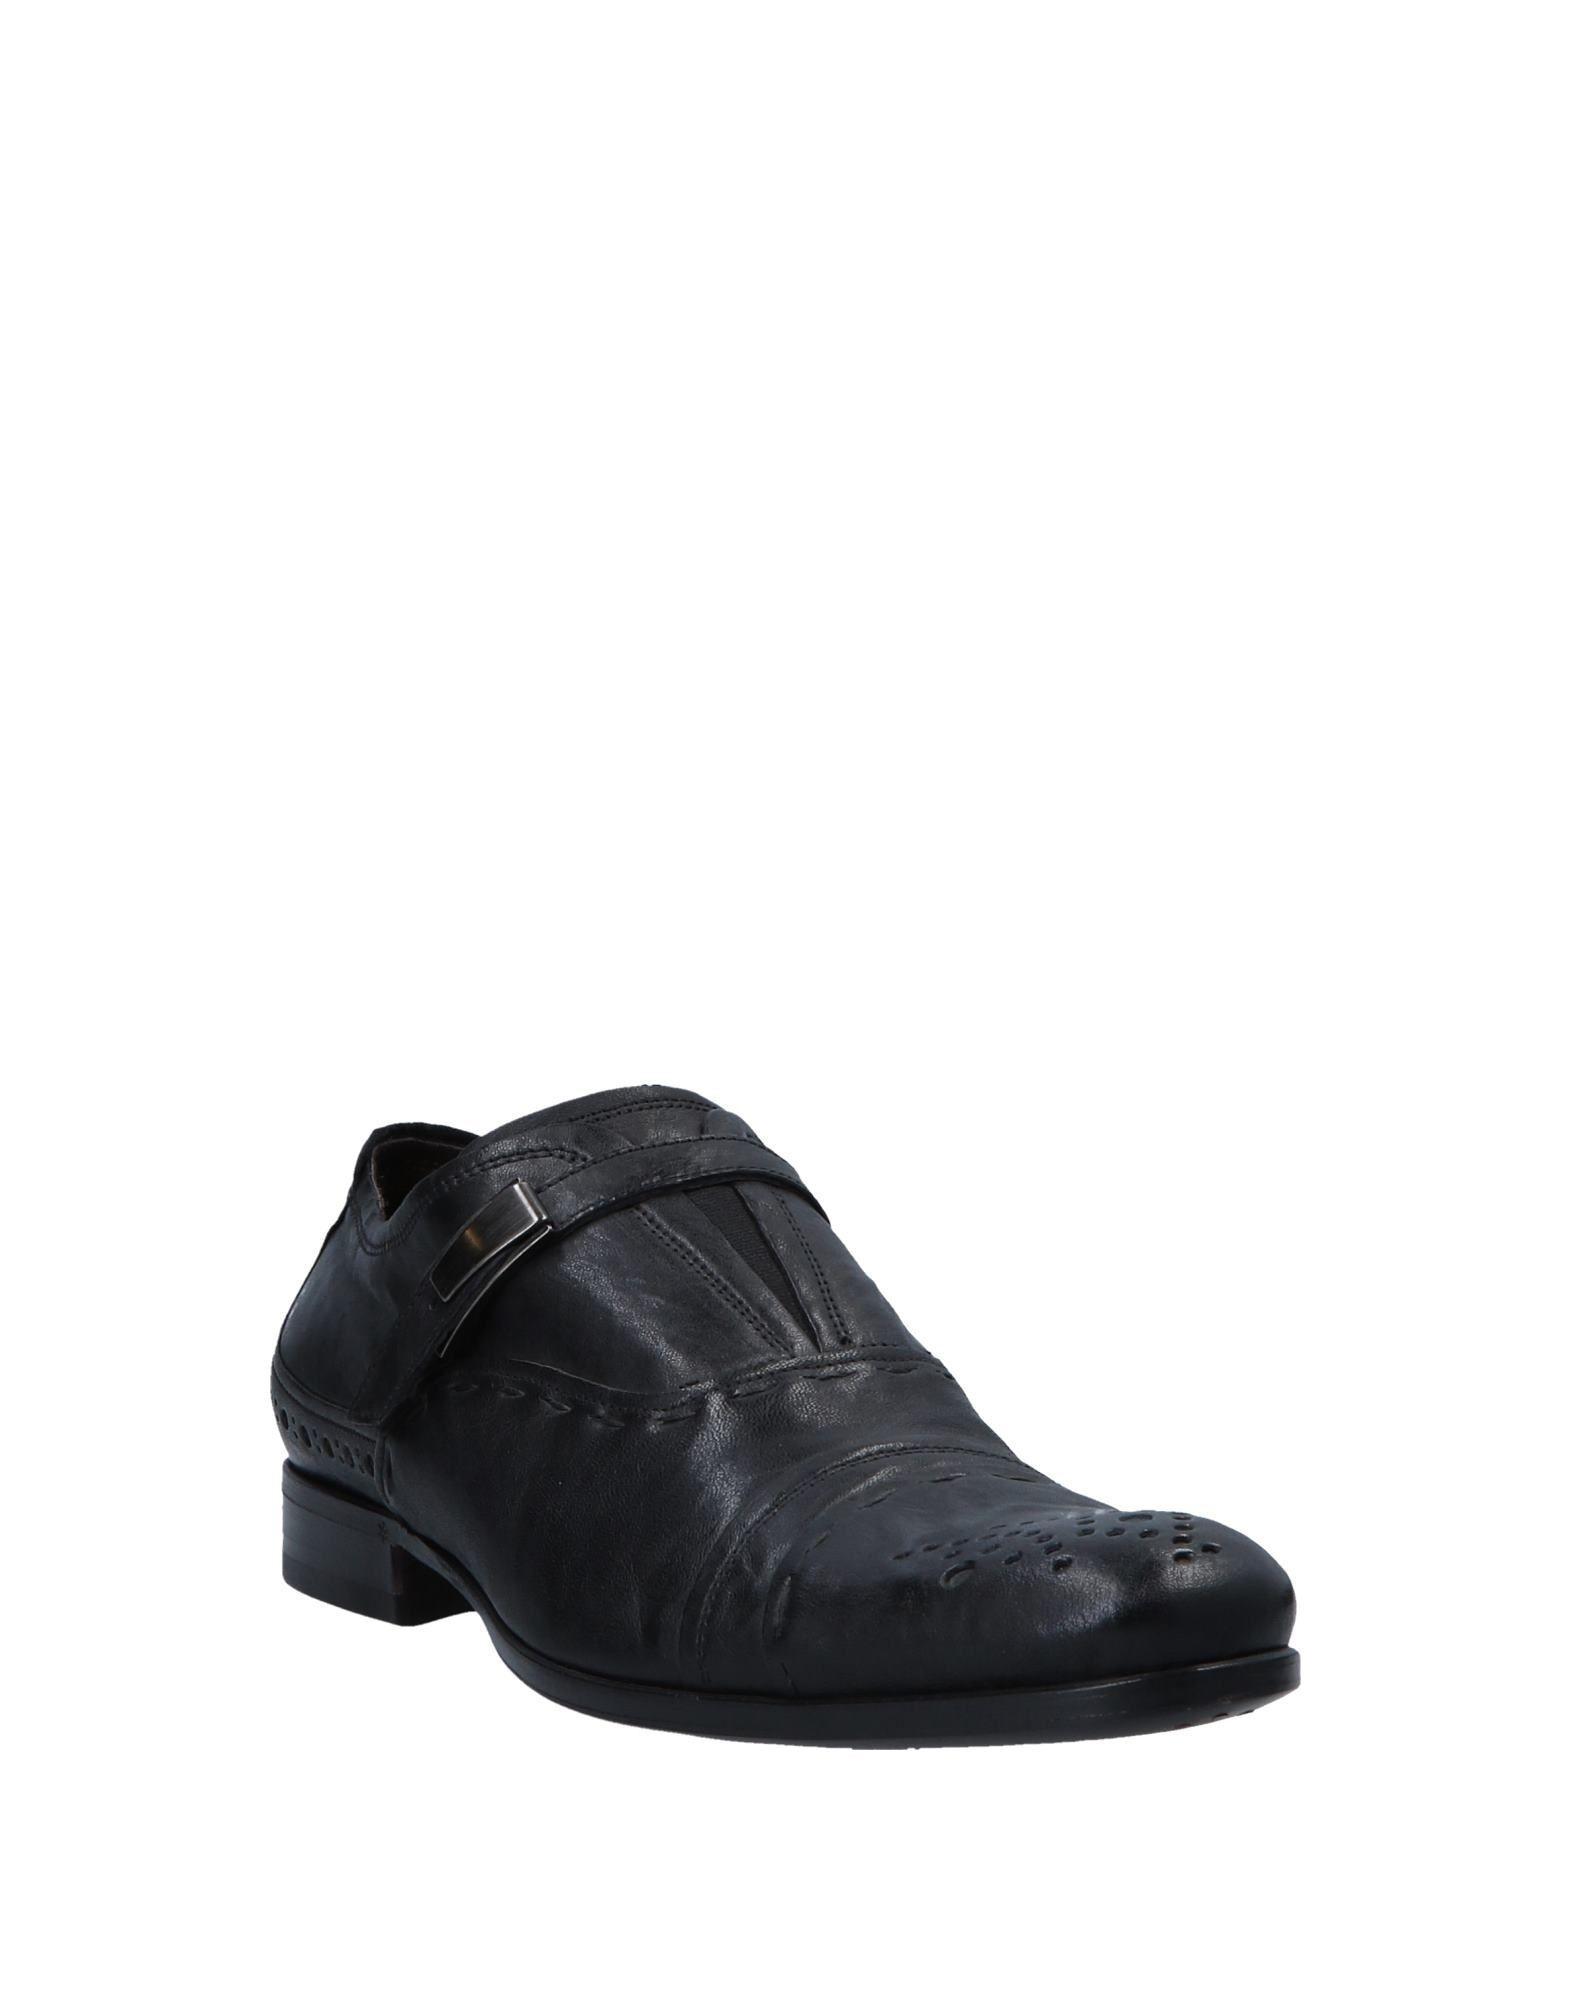 Barracuda Mokassins Herren  beliebte 11547800UO Gute Qualität beliebte  Schuhe d32db2